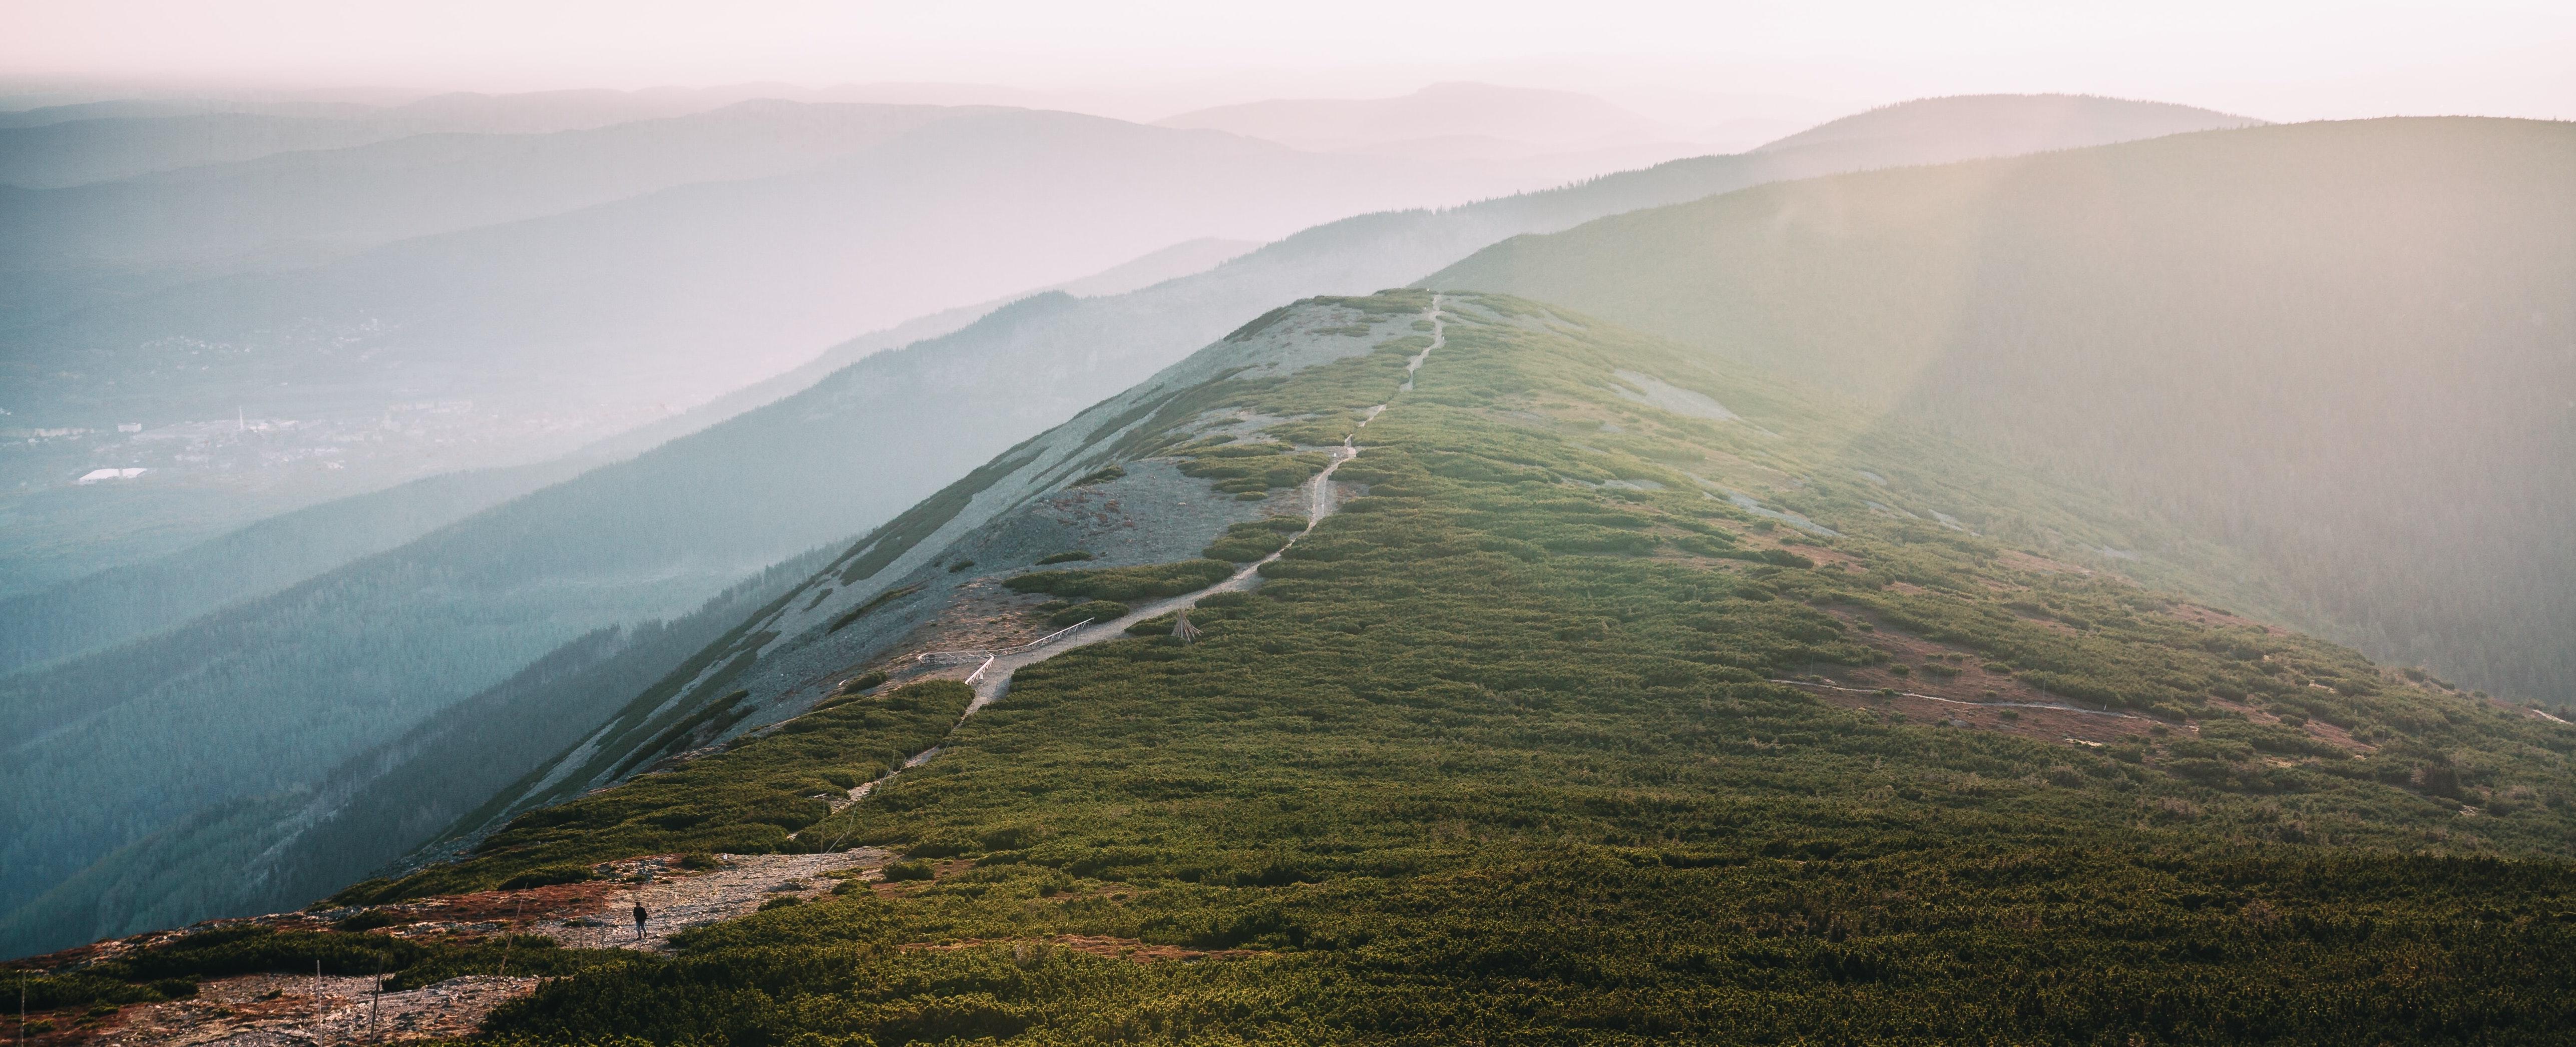 Hiker by Pavel Pesek on Unsplash